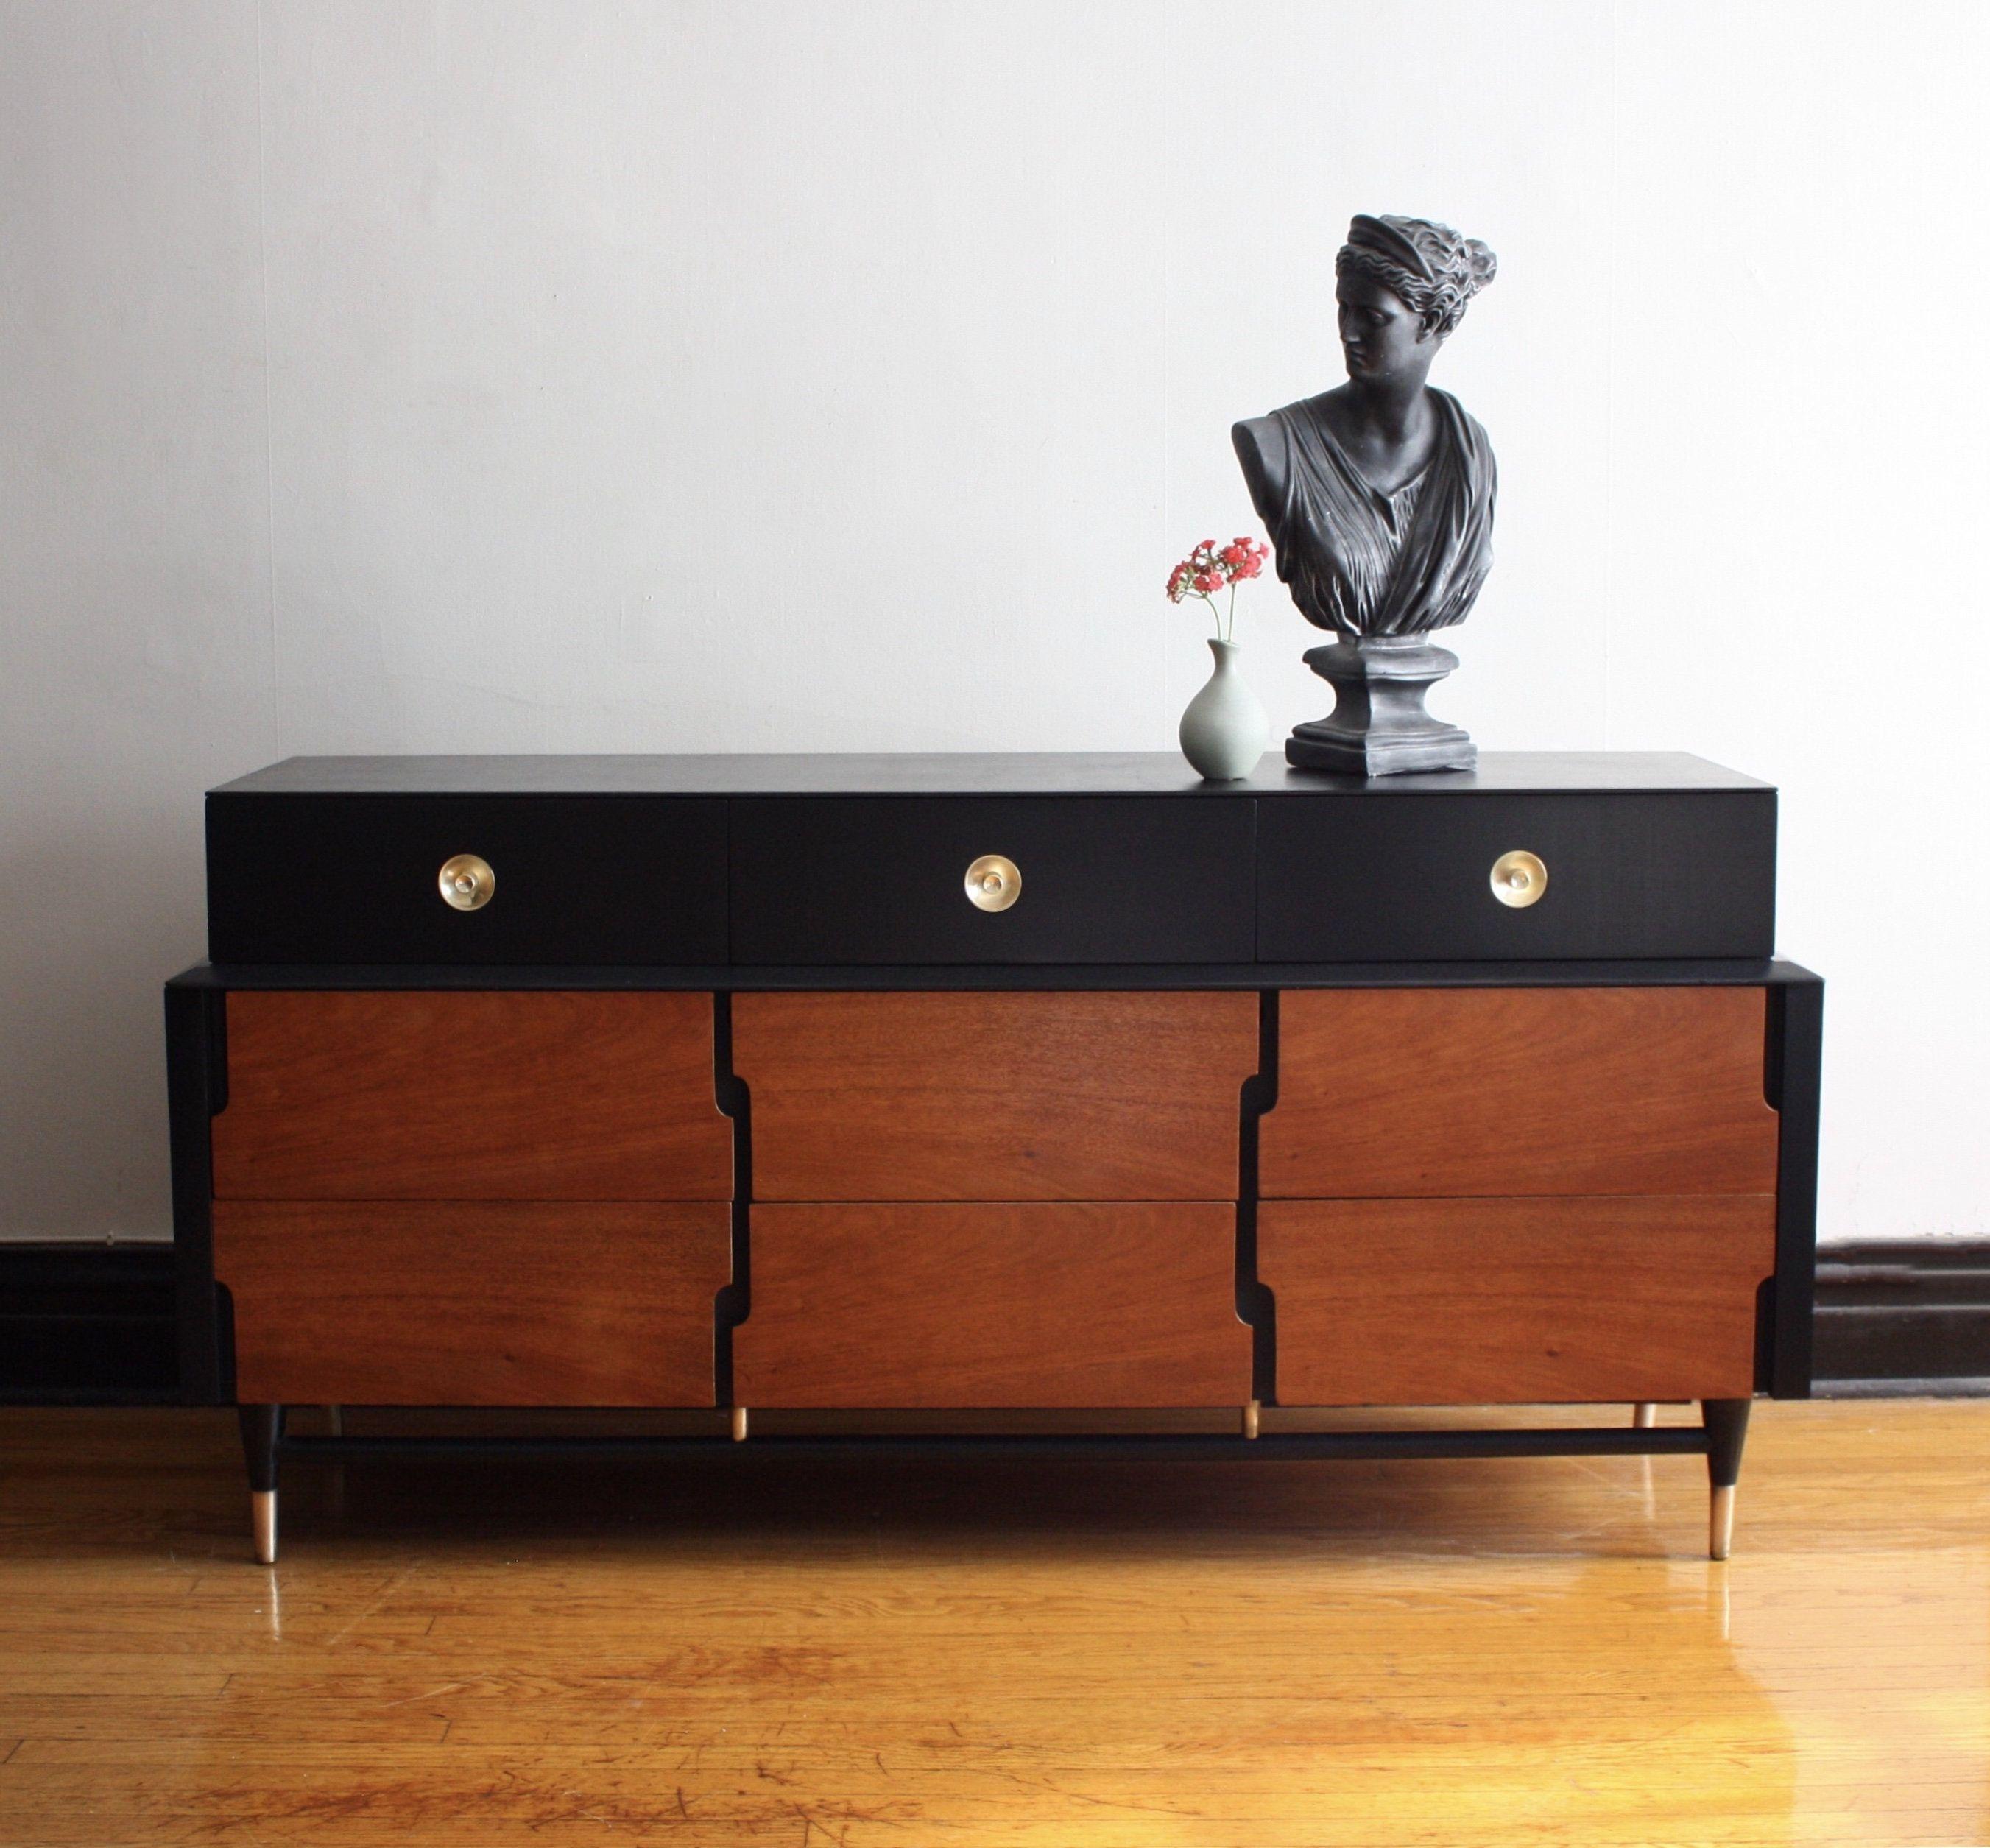 Black And Wood Mid Century Modern Dresser Vintage Mcm Media Console Refinished Mid Century Credenza Refinished Vintage Furniture Furniture Recycled Furniture